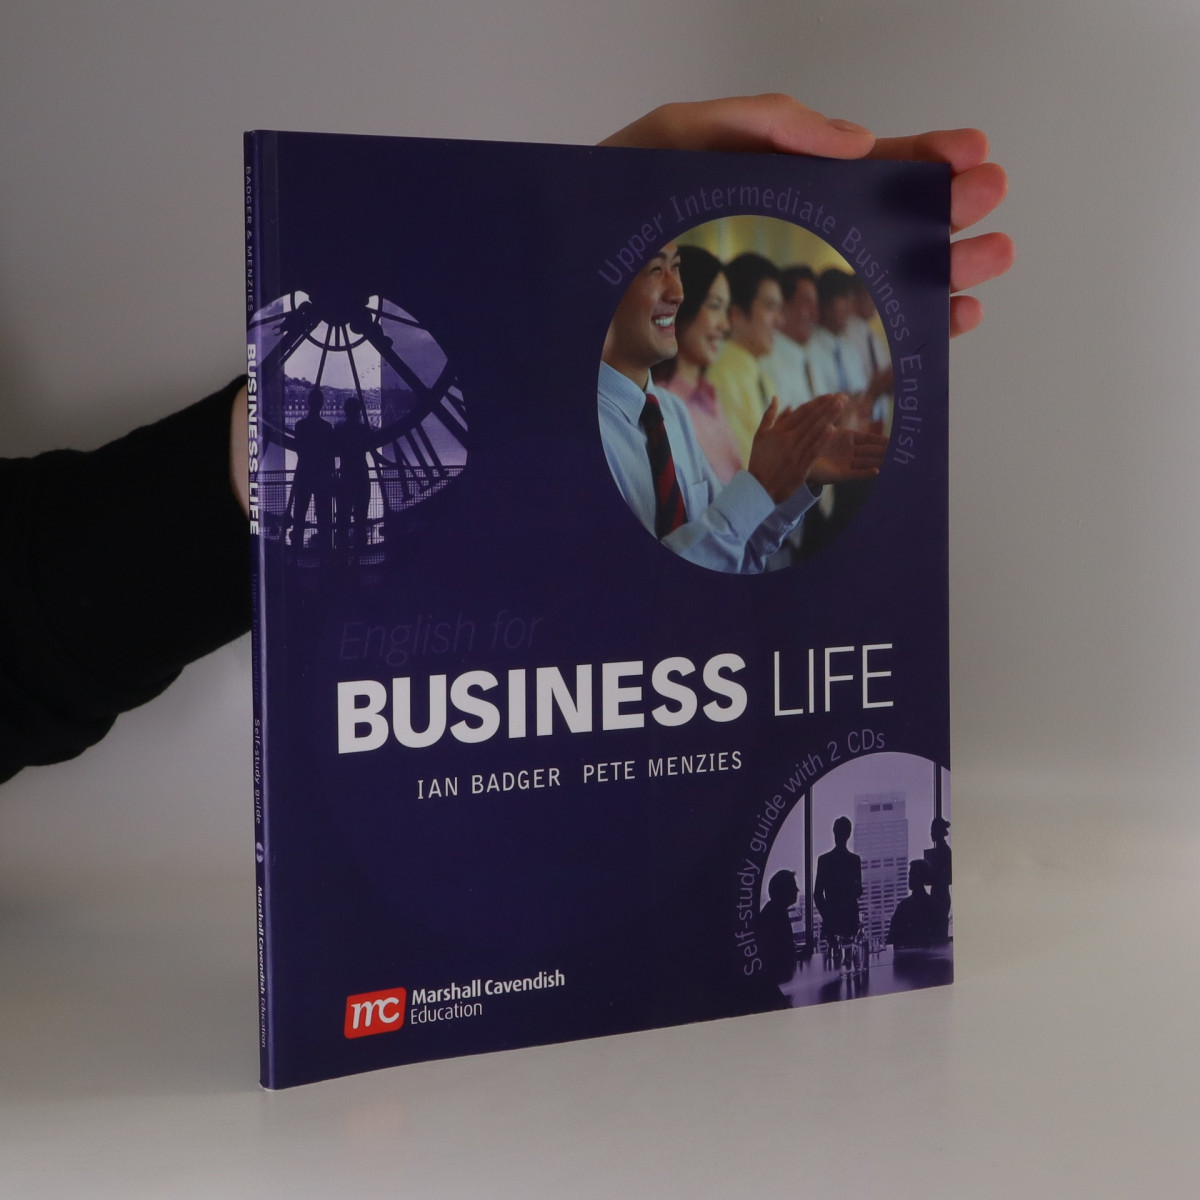 antikvární kniha English for business life : upper intermediate self-study guide, 2007